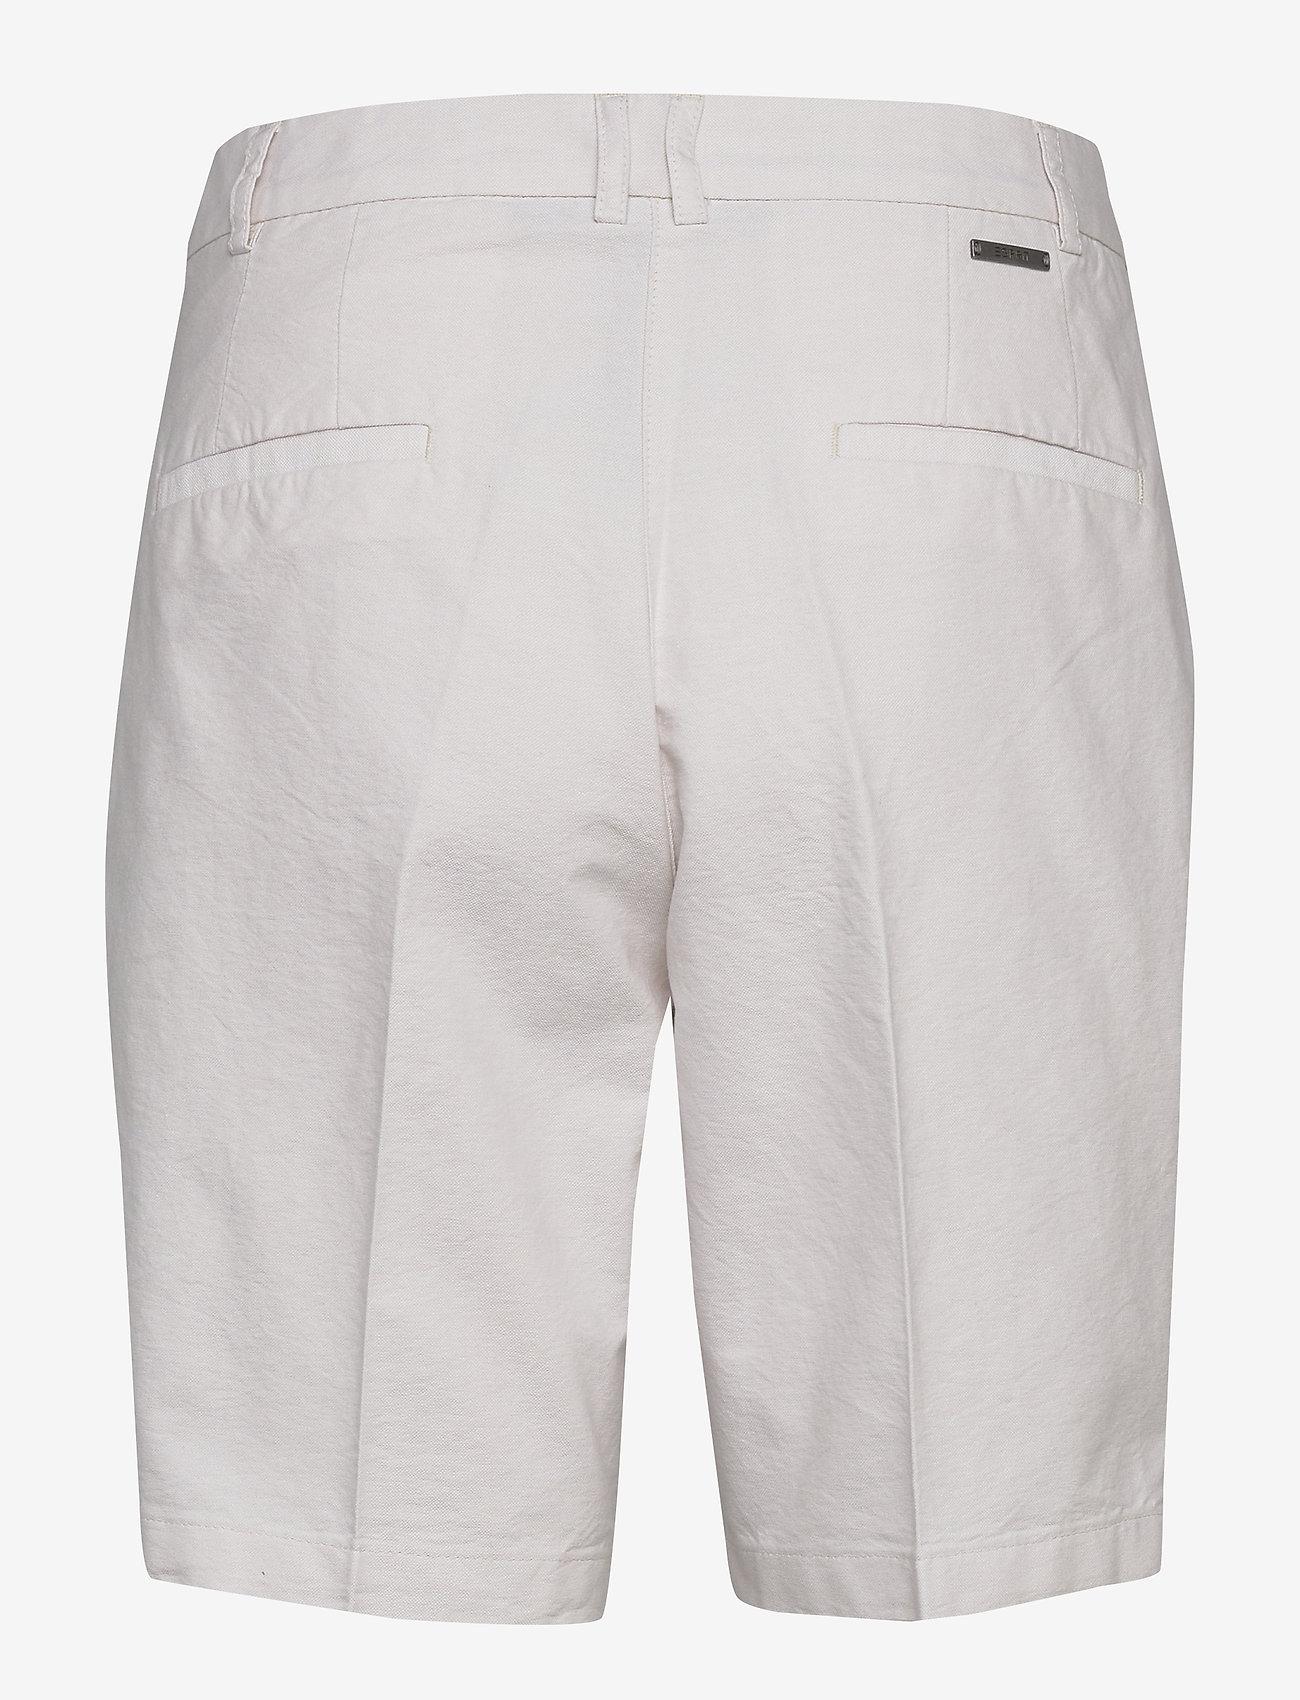 Shorts Woven (Sand) (349.99 kr) - Esprit Casual